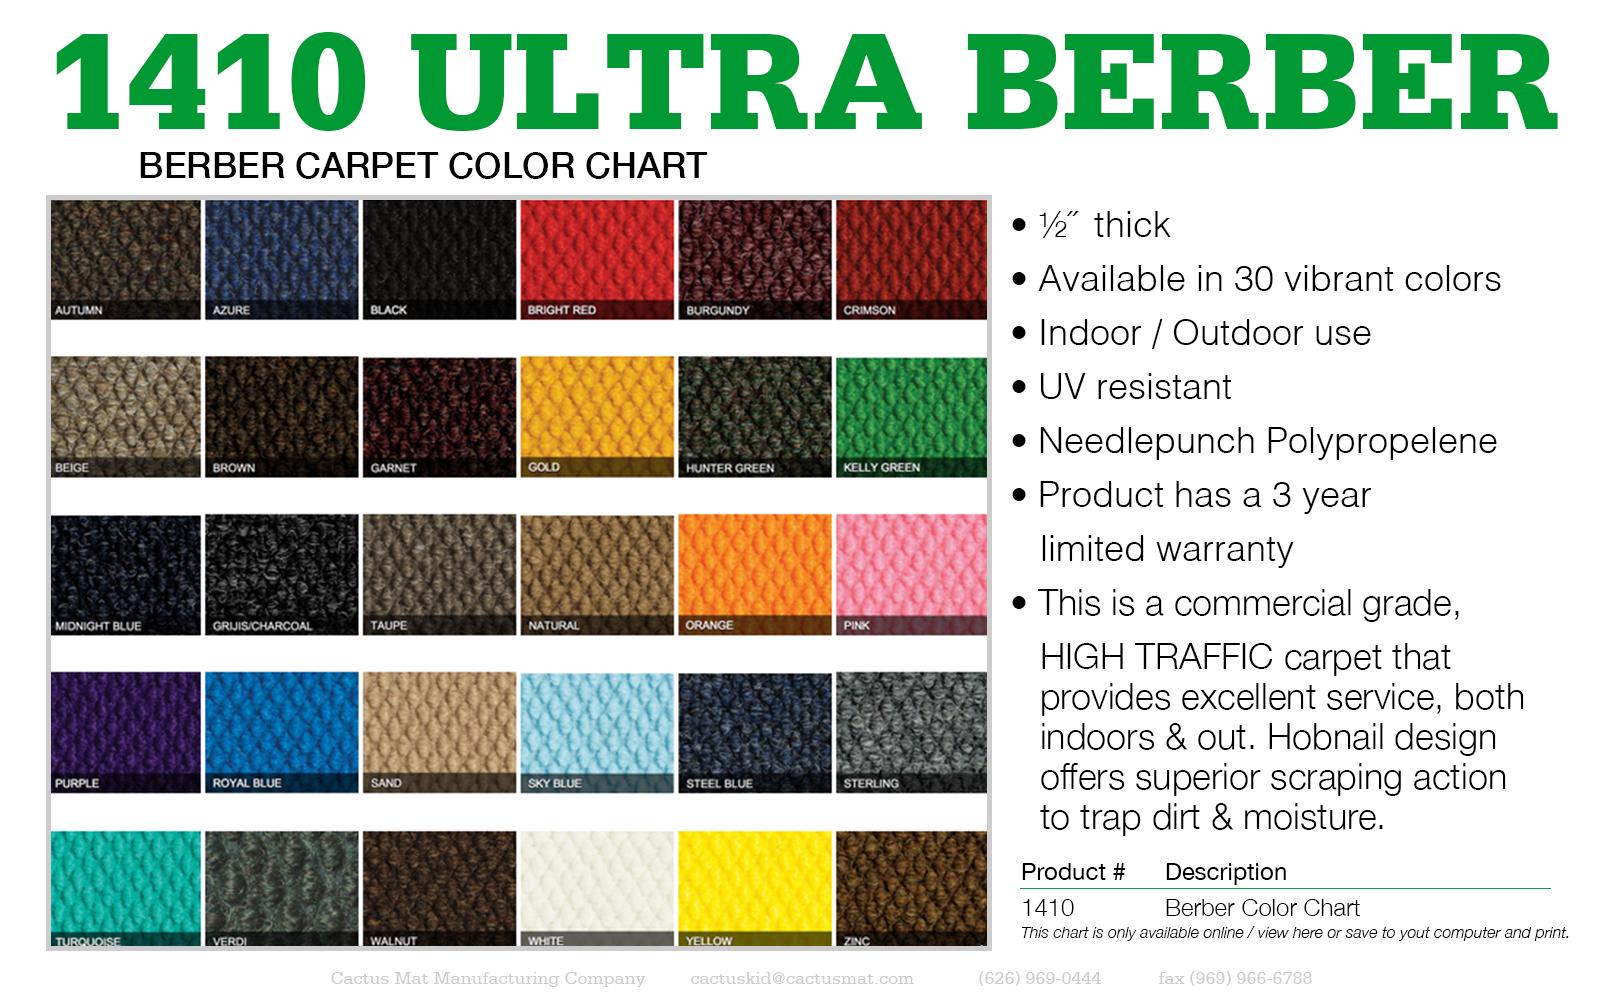 Berber_1410_ColorSwatchMaster.jpg